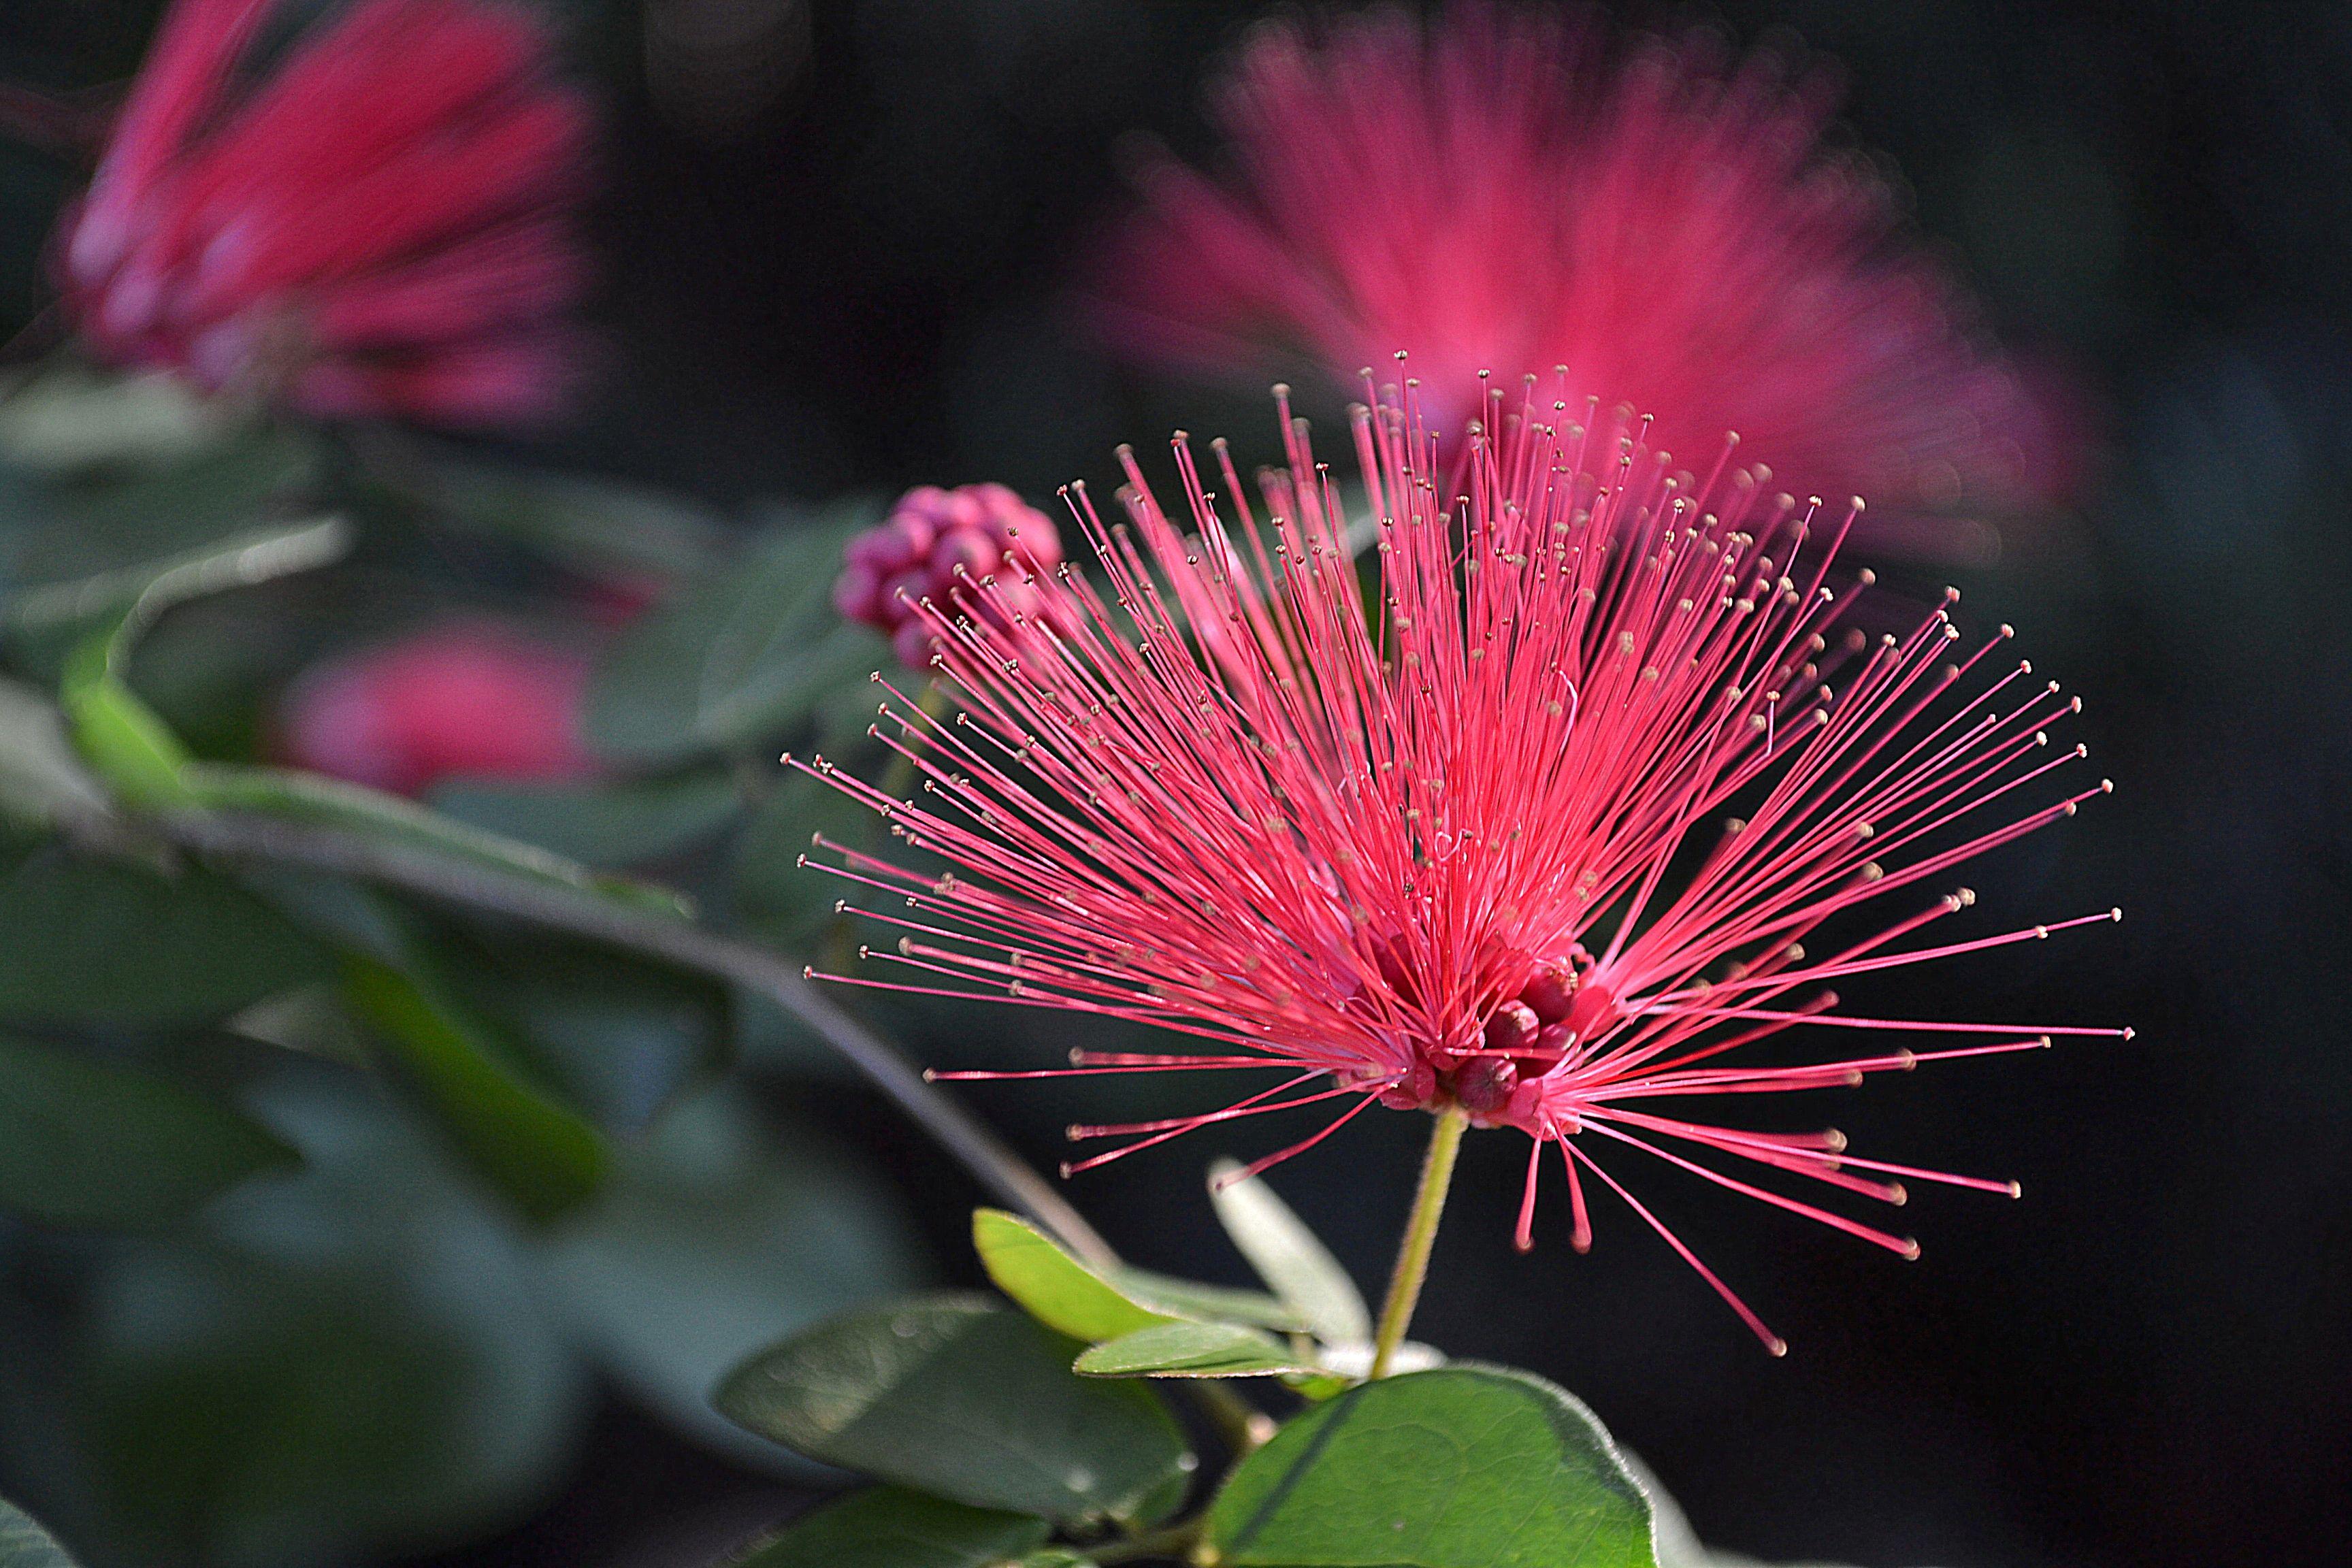 Red Powderpuff 'Nana' Calliandra haematocephala Little